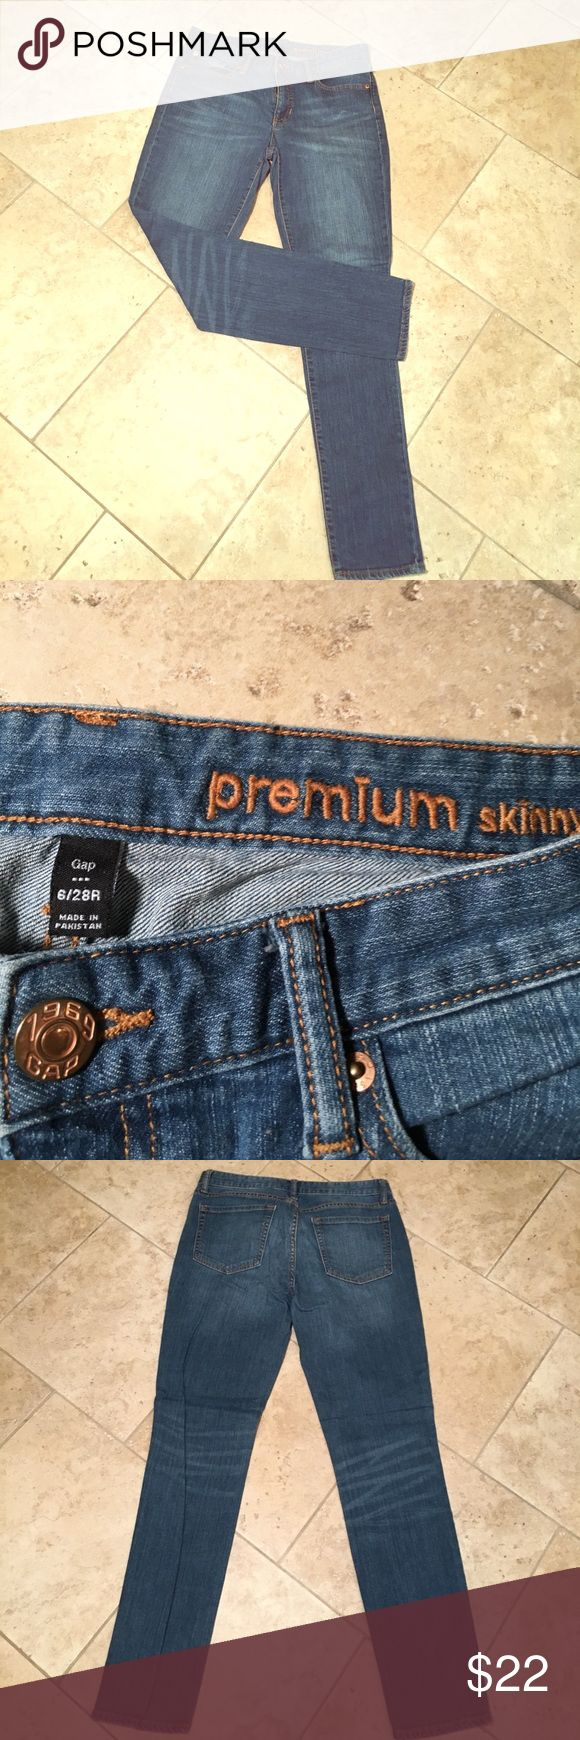 Gap Jeans Premium Skinny Size 6 Gap Jeans. Premium Skinny 5 pocket jean. Like New!!! GAP Jeans Skinny